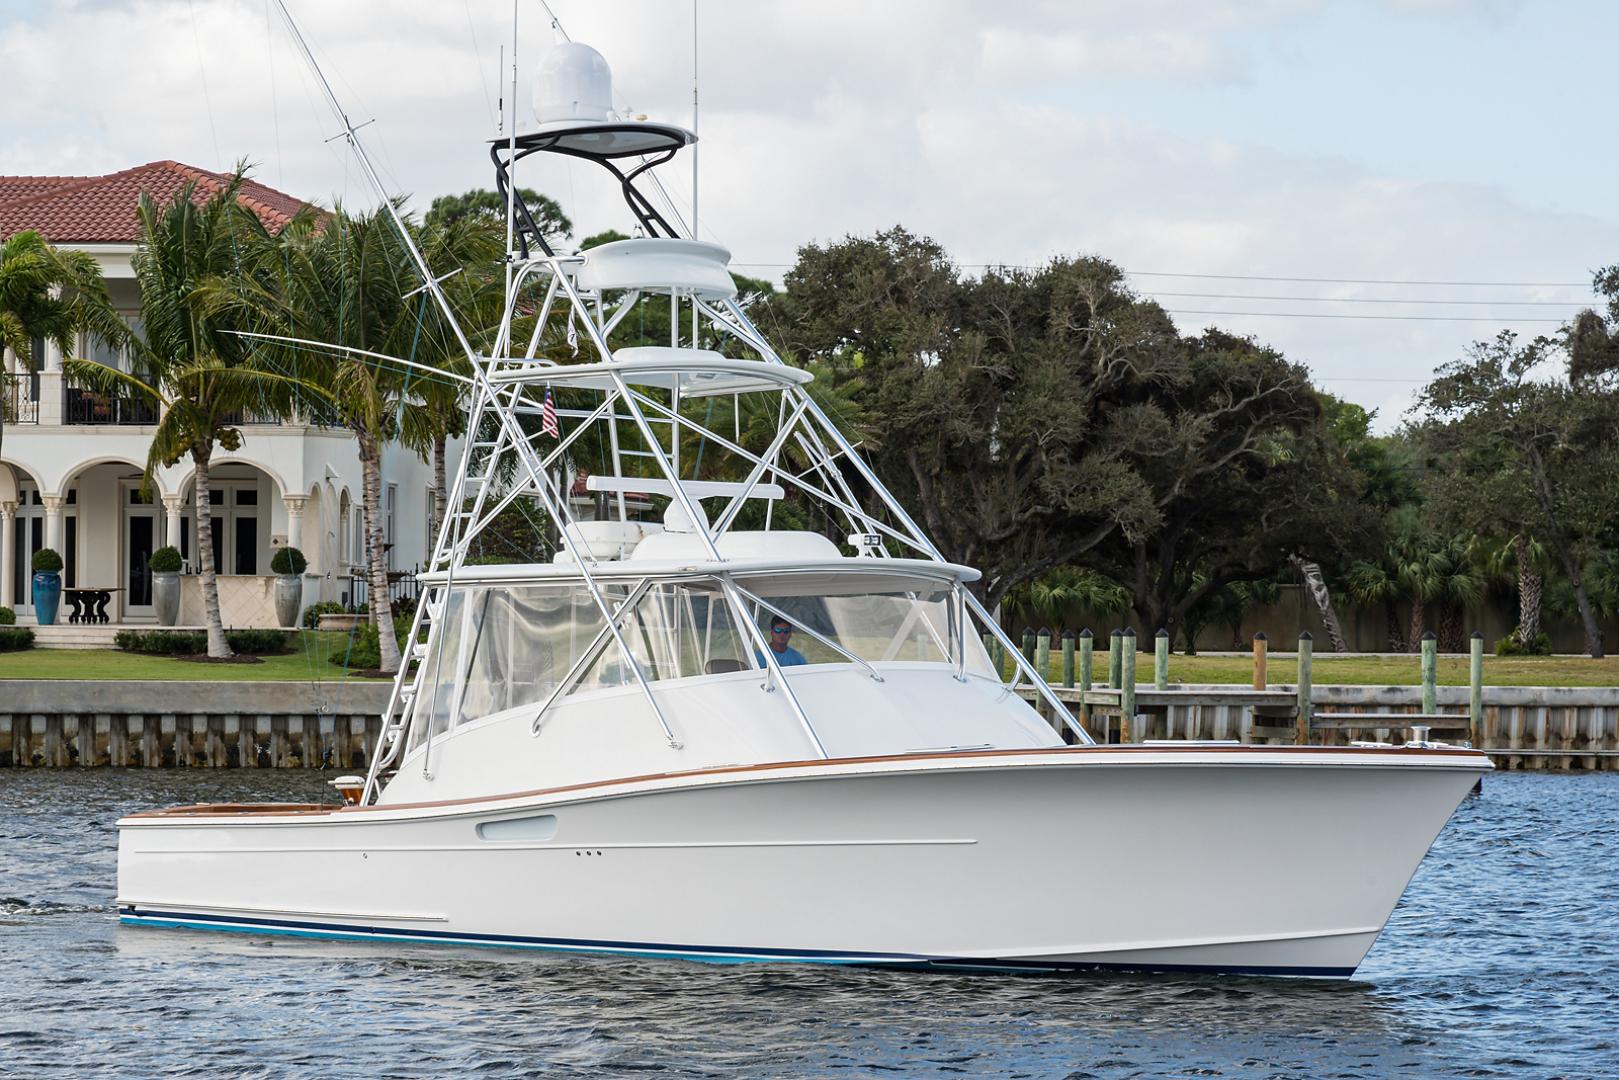 Release-One-of-A-Kind Custom Express 2014-Gladiator Jupiter-Florida-United States-Gladiator-1370137   Thumbnail